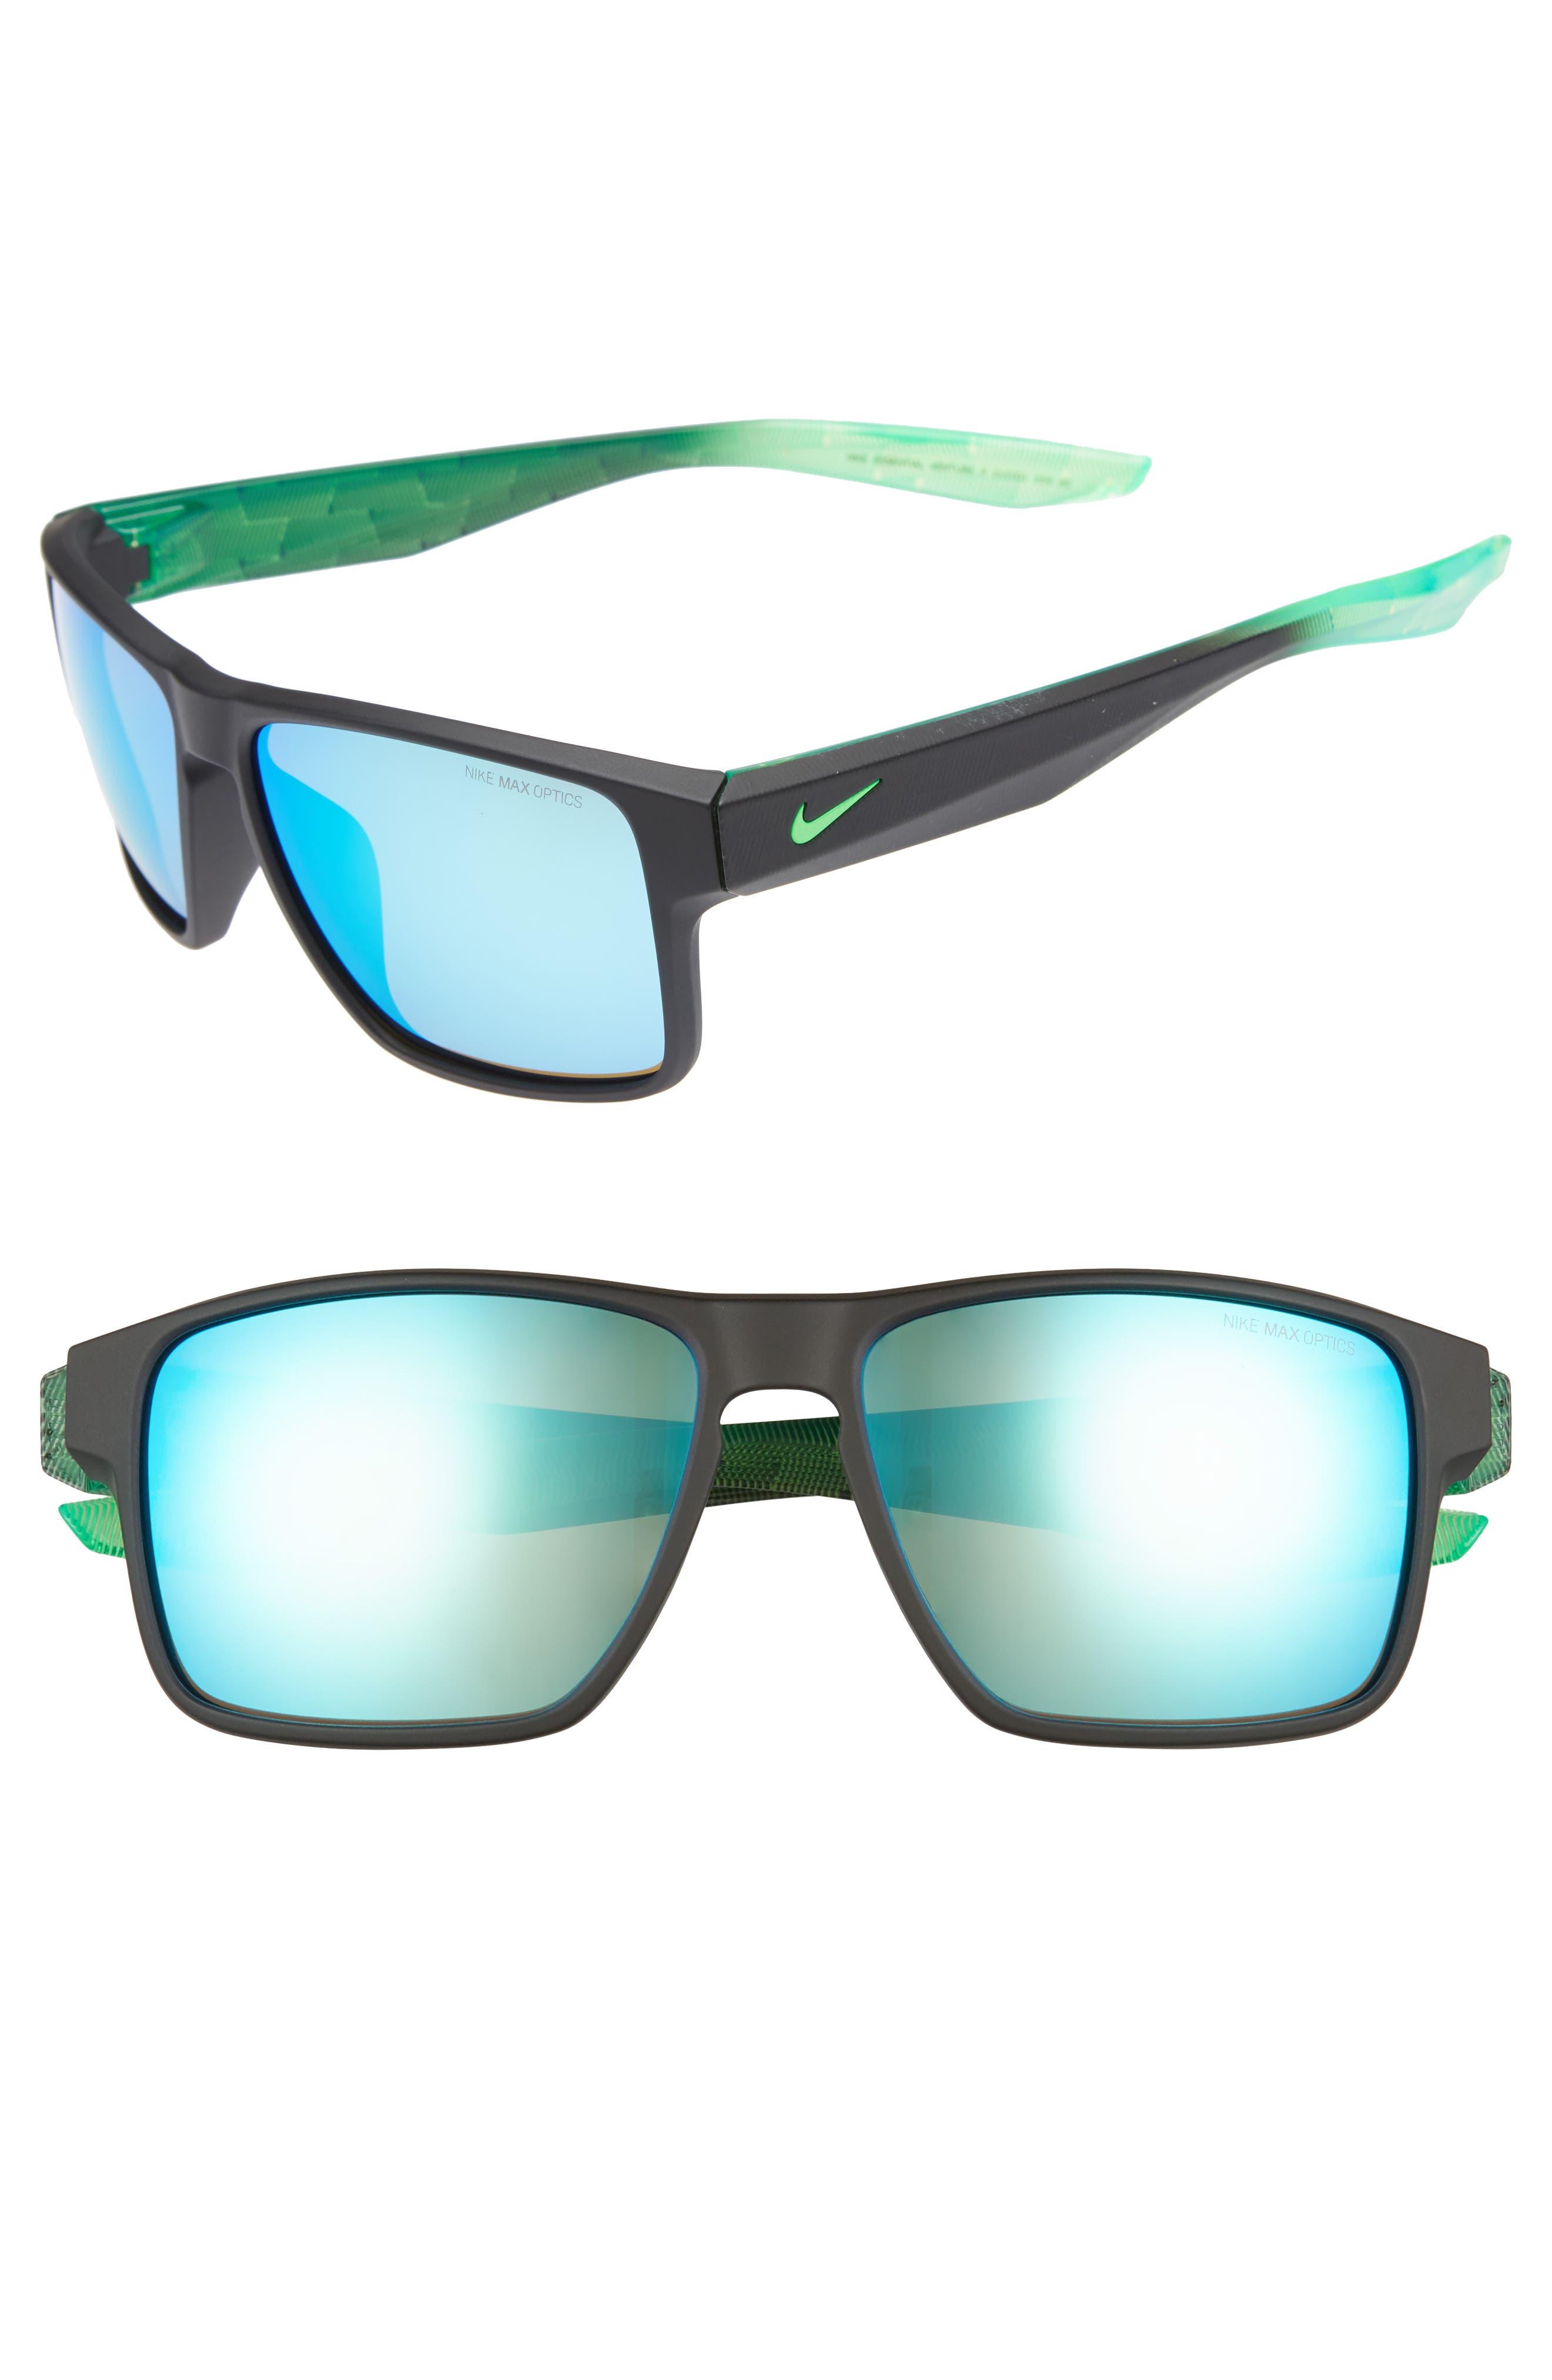 Essential Venture R 59mm Sunglasses,                             Main thumbnail 1, color,                             MATTE BLACK/ GREEN